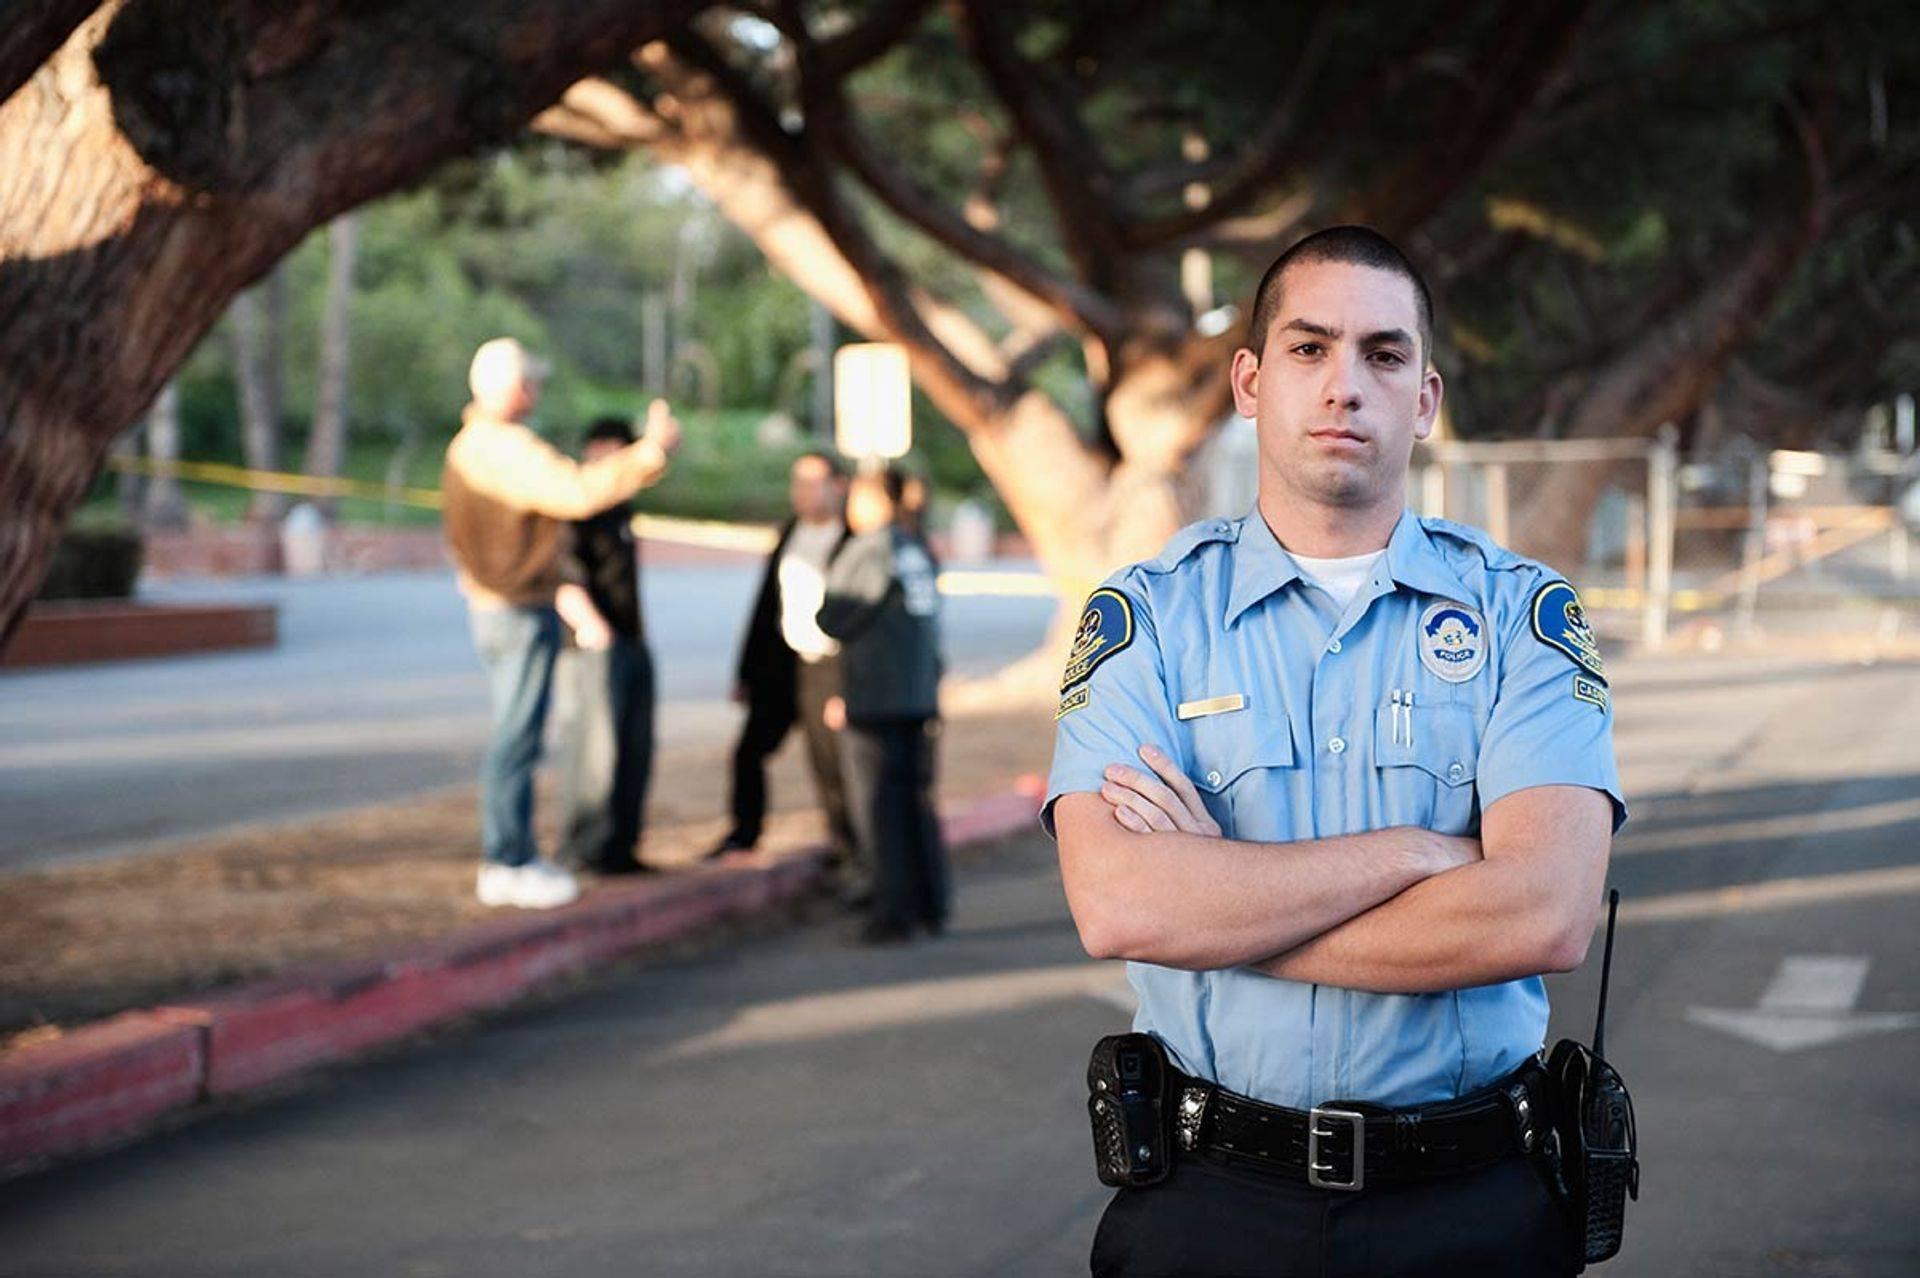 Uniform security guard, Boston, MA